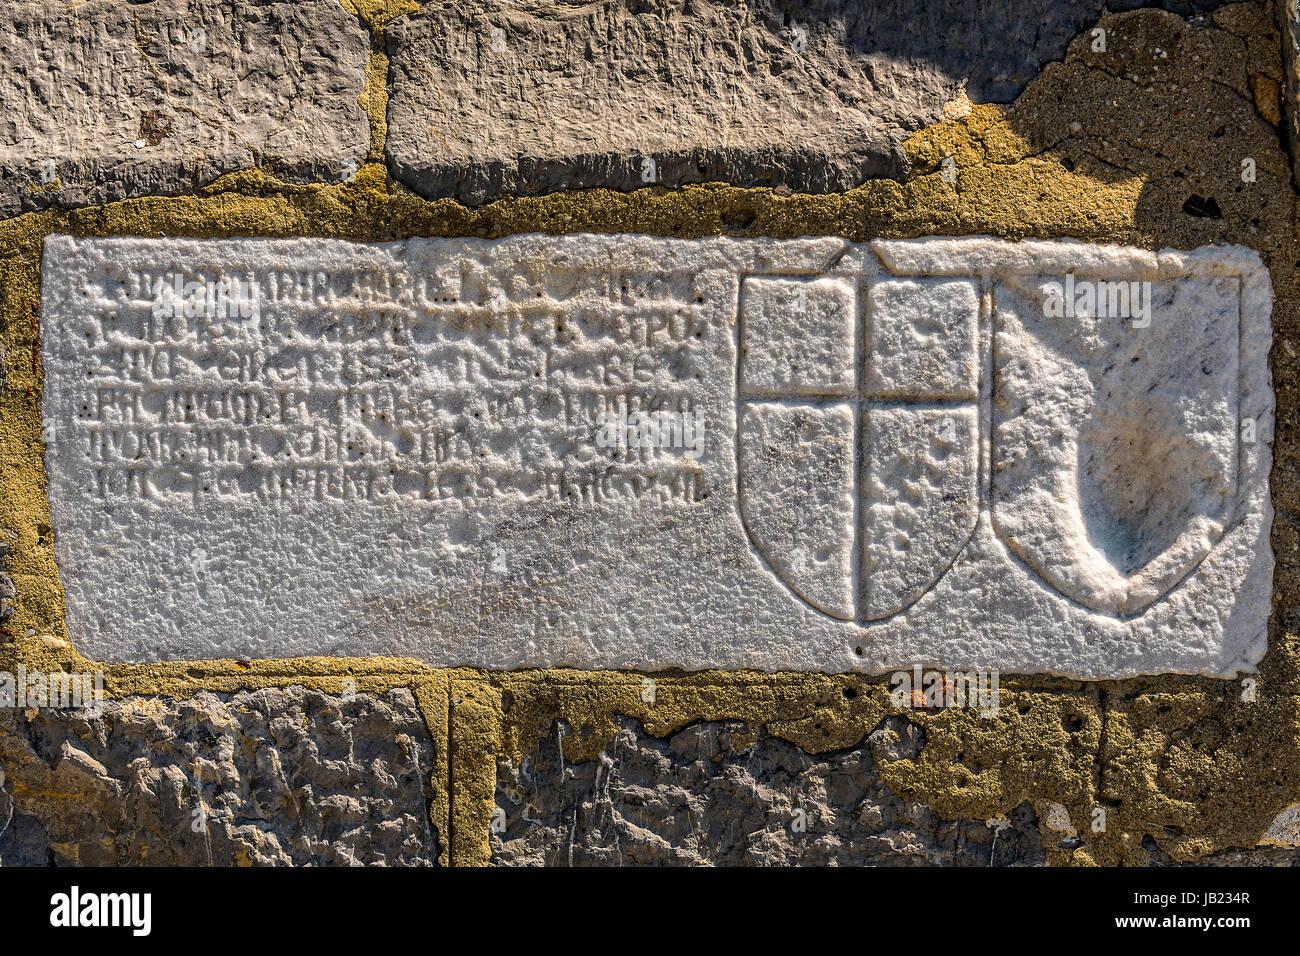 Italy Liguria Portovenere - St Lorenzo basilica ( Madonna Bianca Sanctuary ) - Inscription on the exterior facade - Stock Image